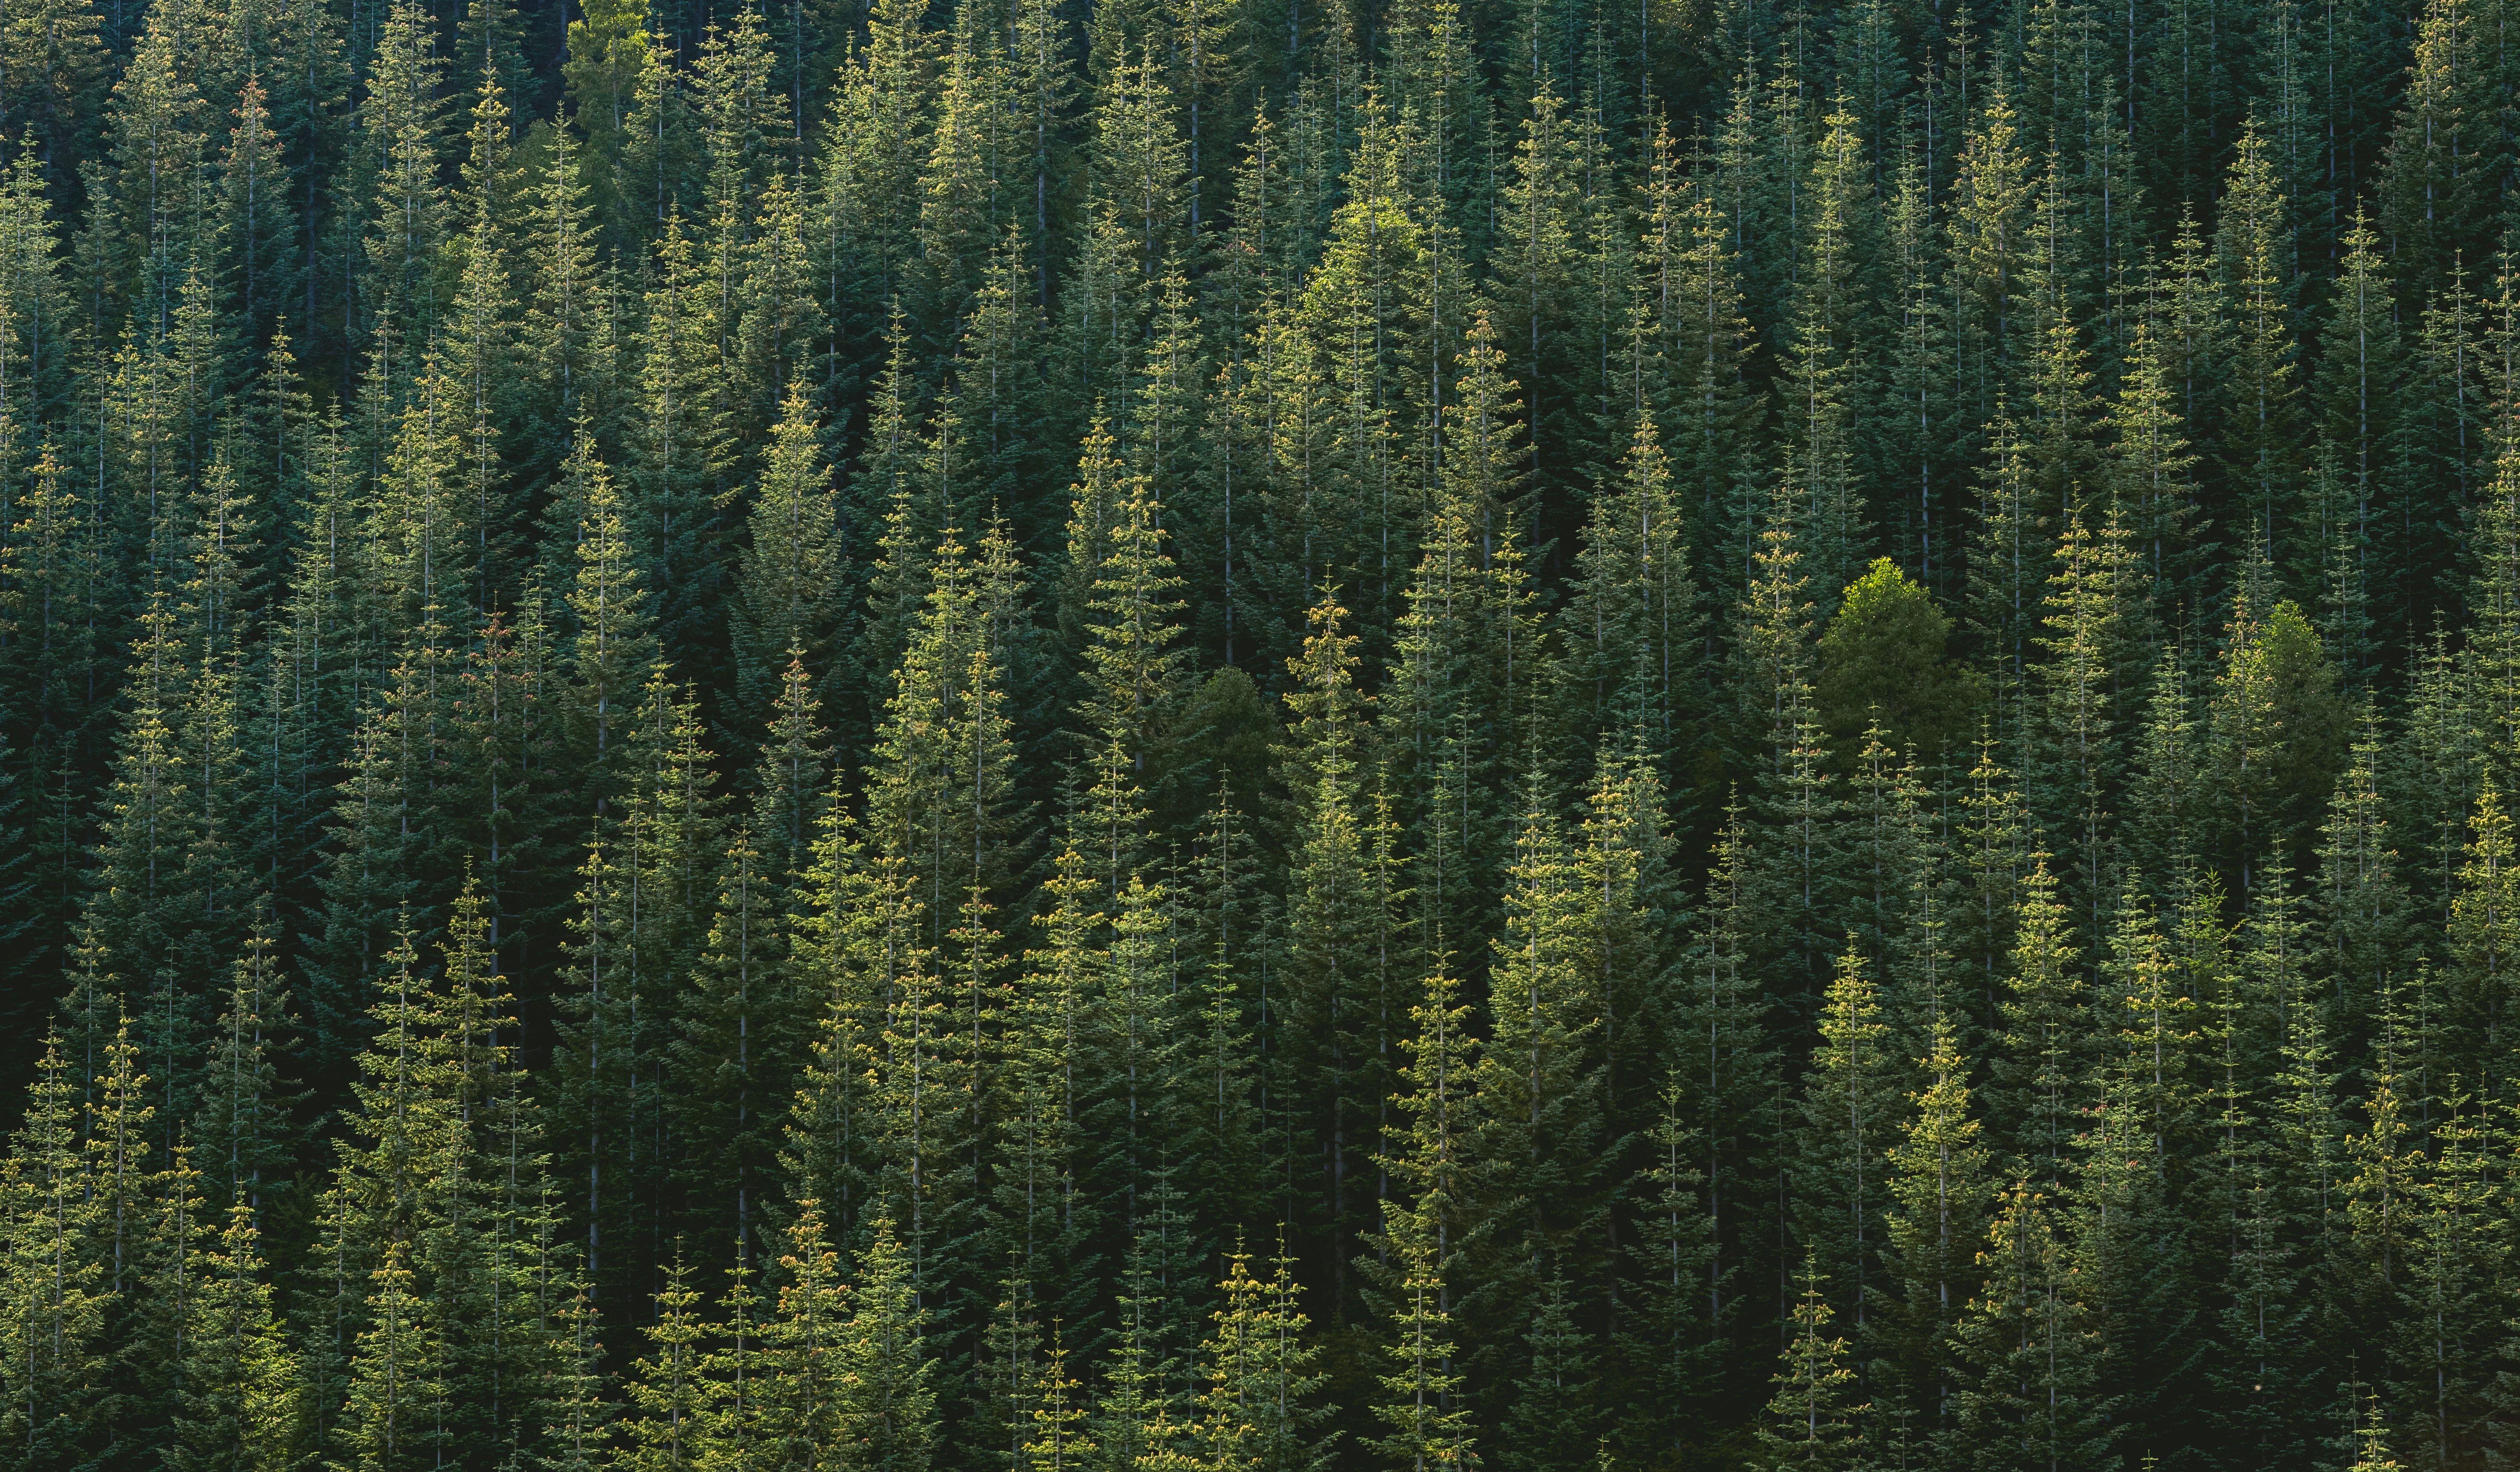 Evergreen forrest